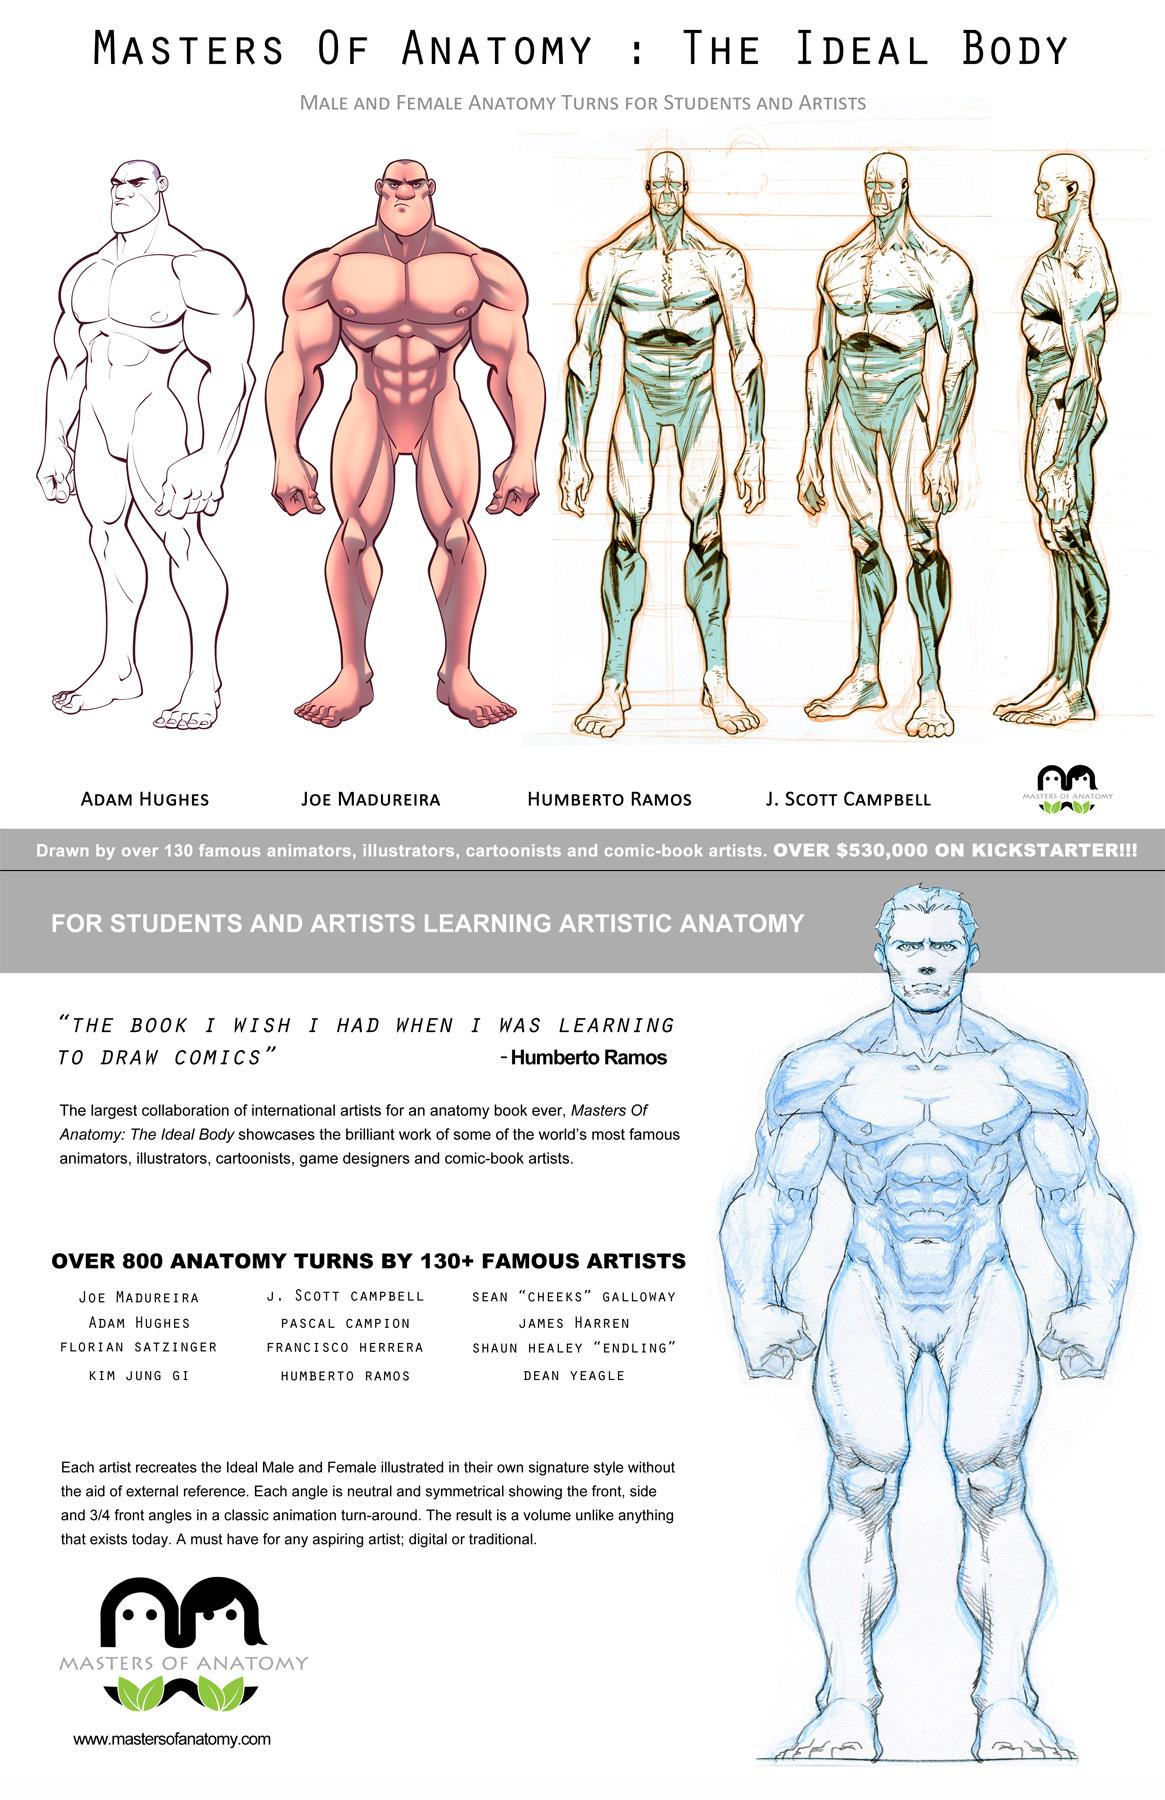 [inspi] Vos dernières lectures, podcasts, vidéo intéressantes ... - Page 2 Bd5b14b4ba060a6e-masters_of_anatomy_cover_front_back